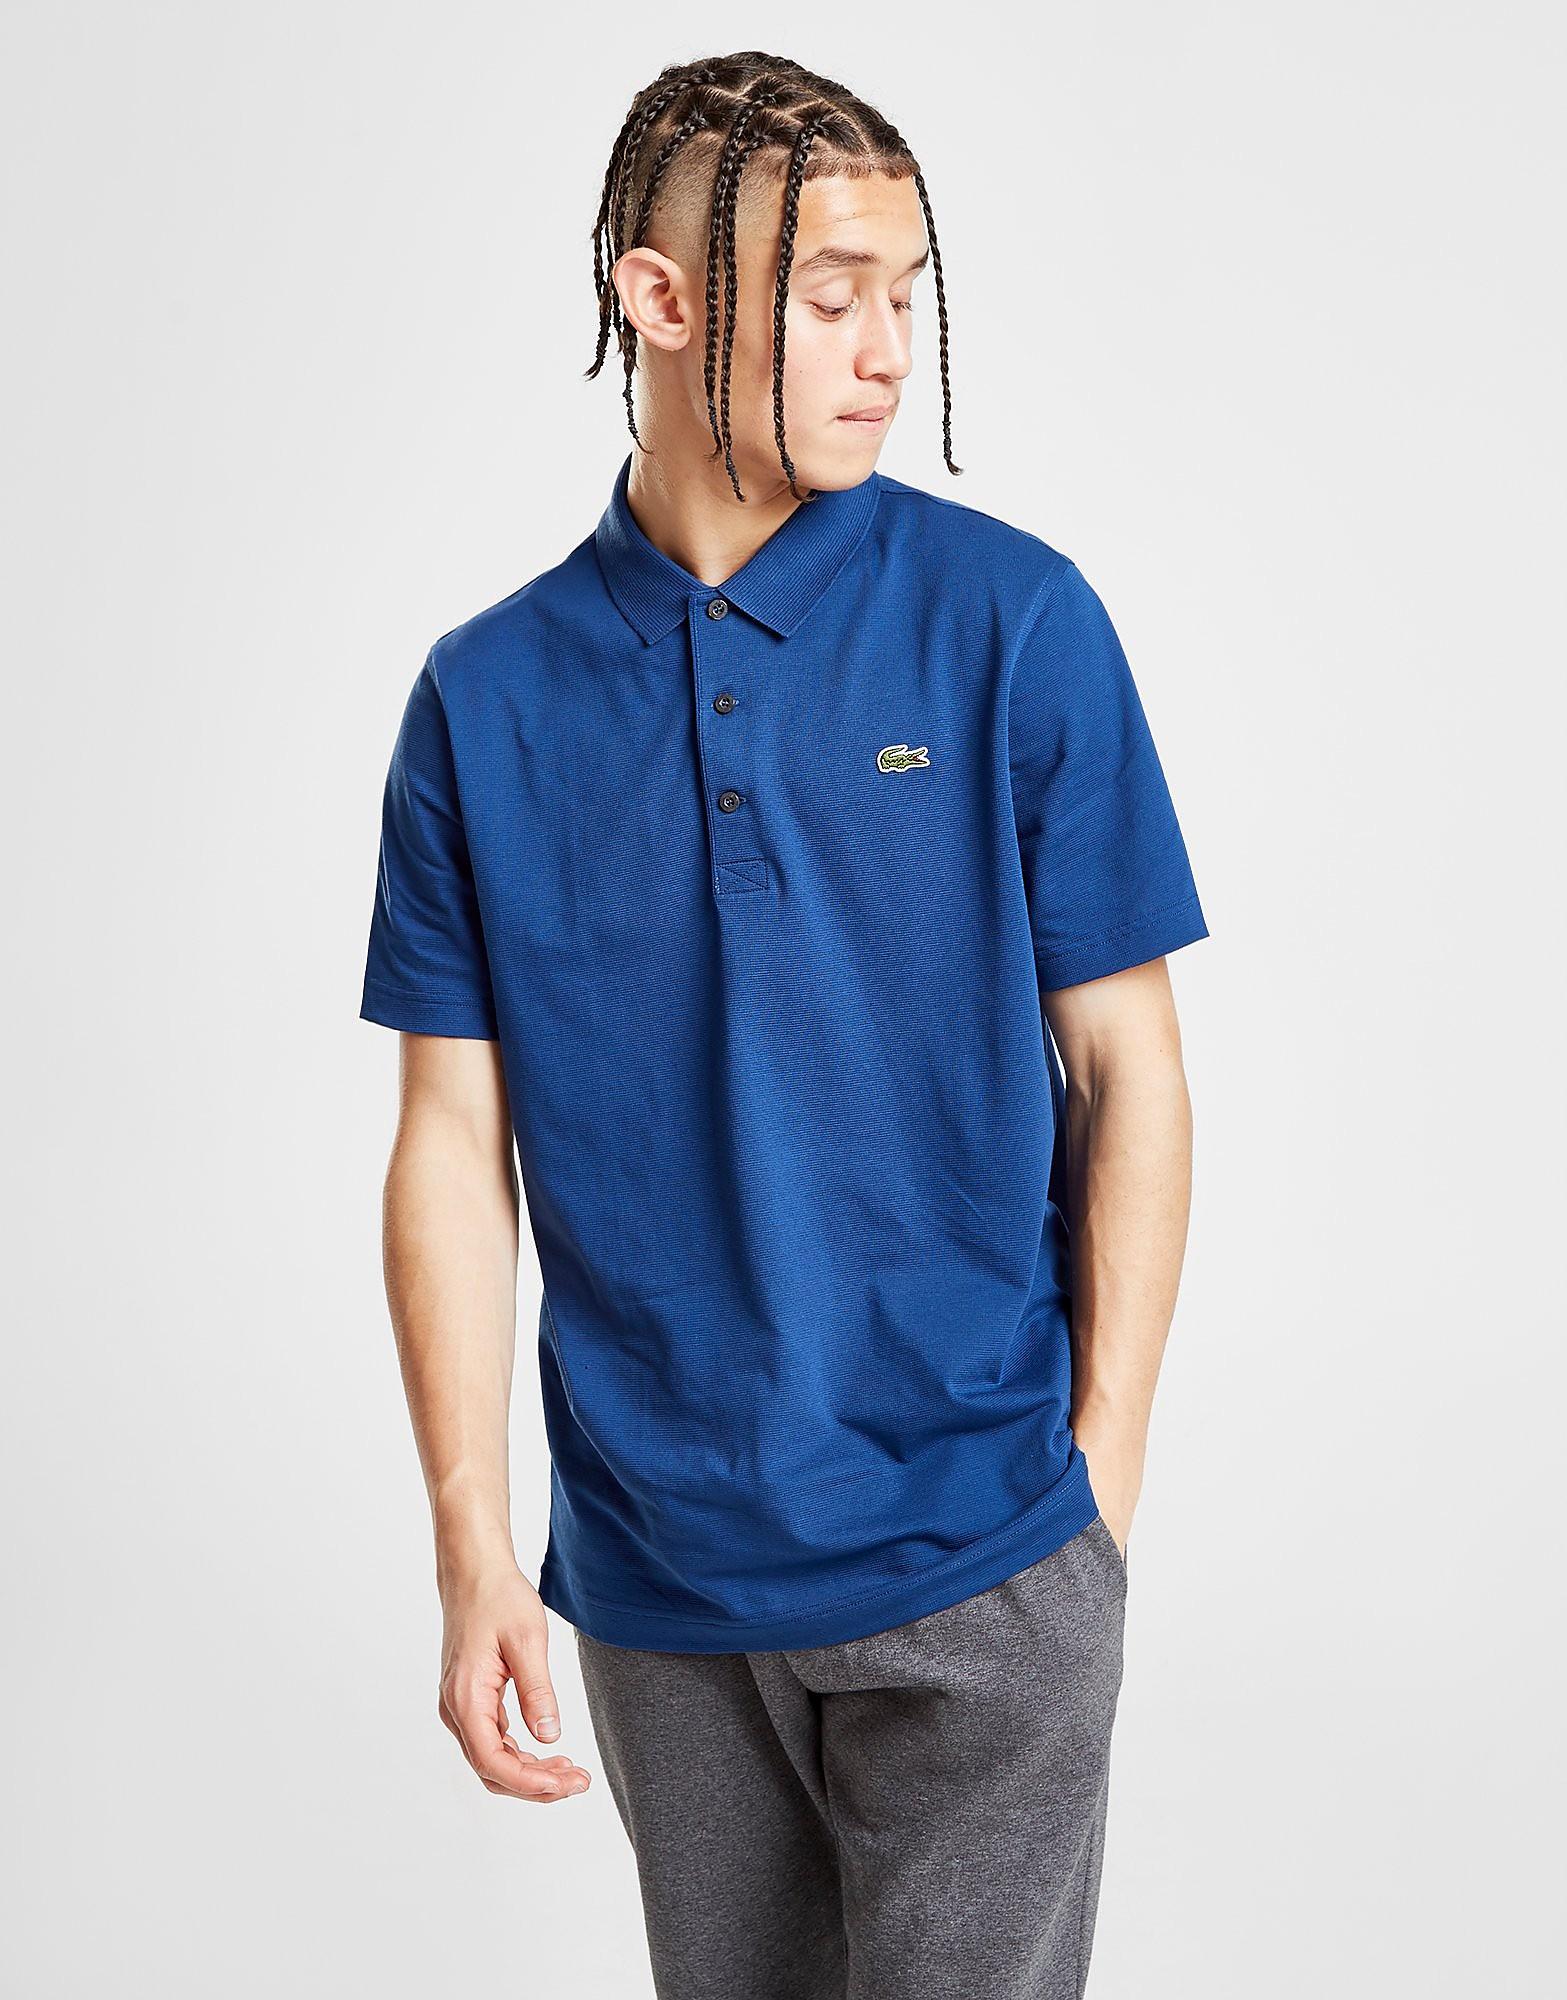 Lacoste Alligator Short Sleeve Polo Shirt Heren - Blauw - Heren